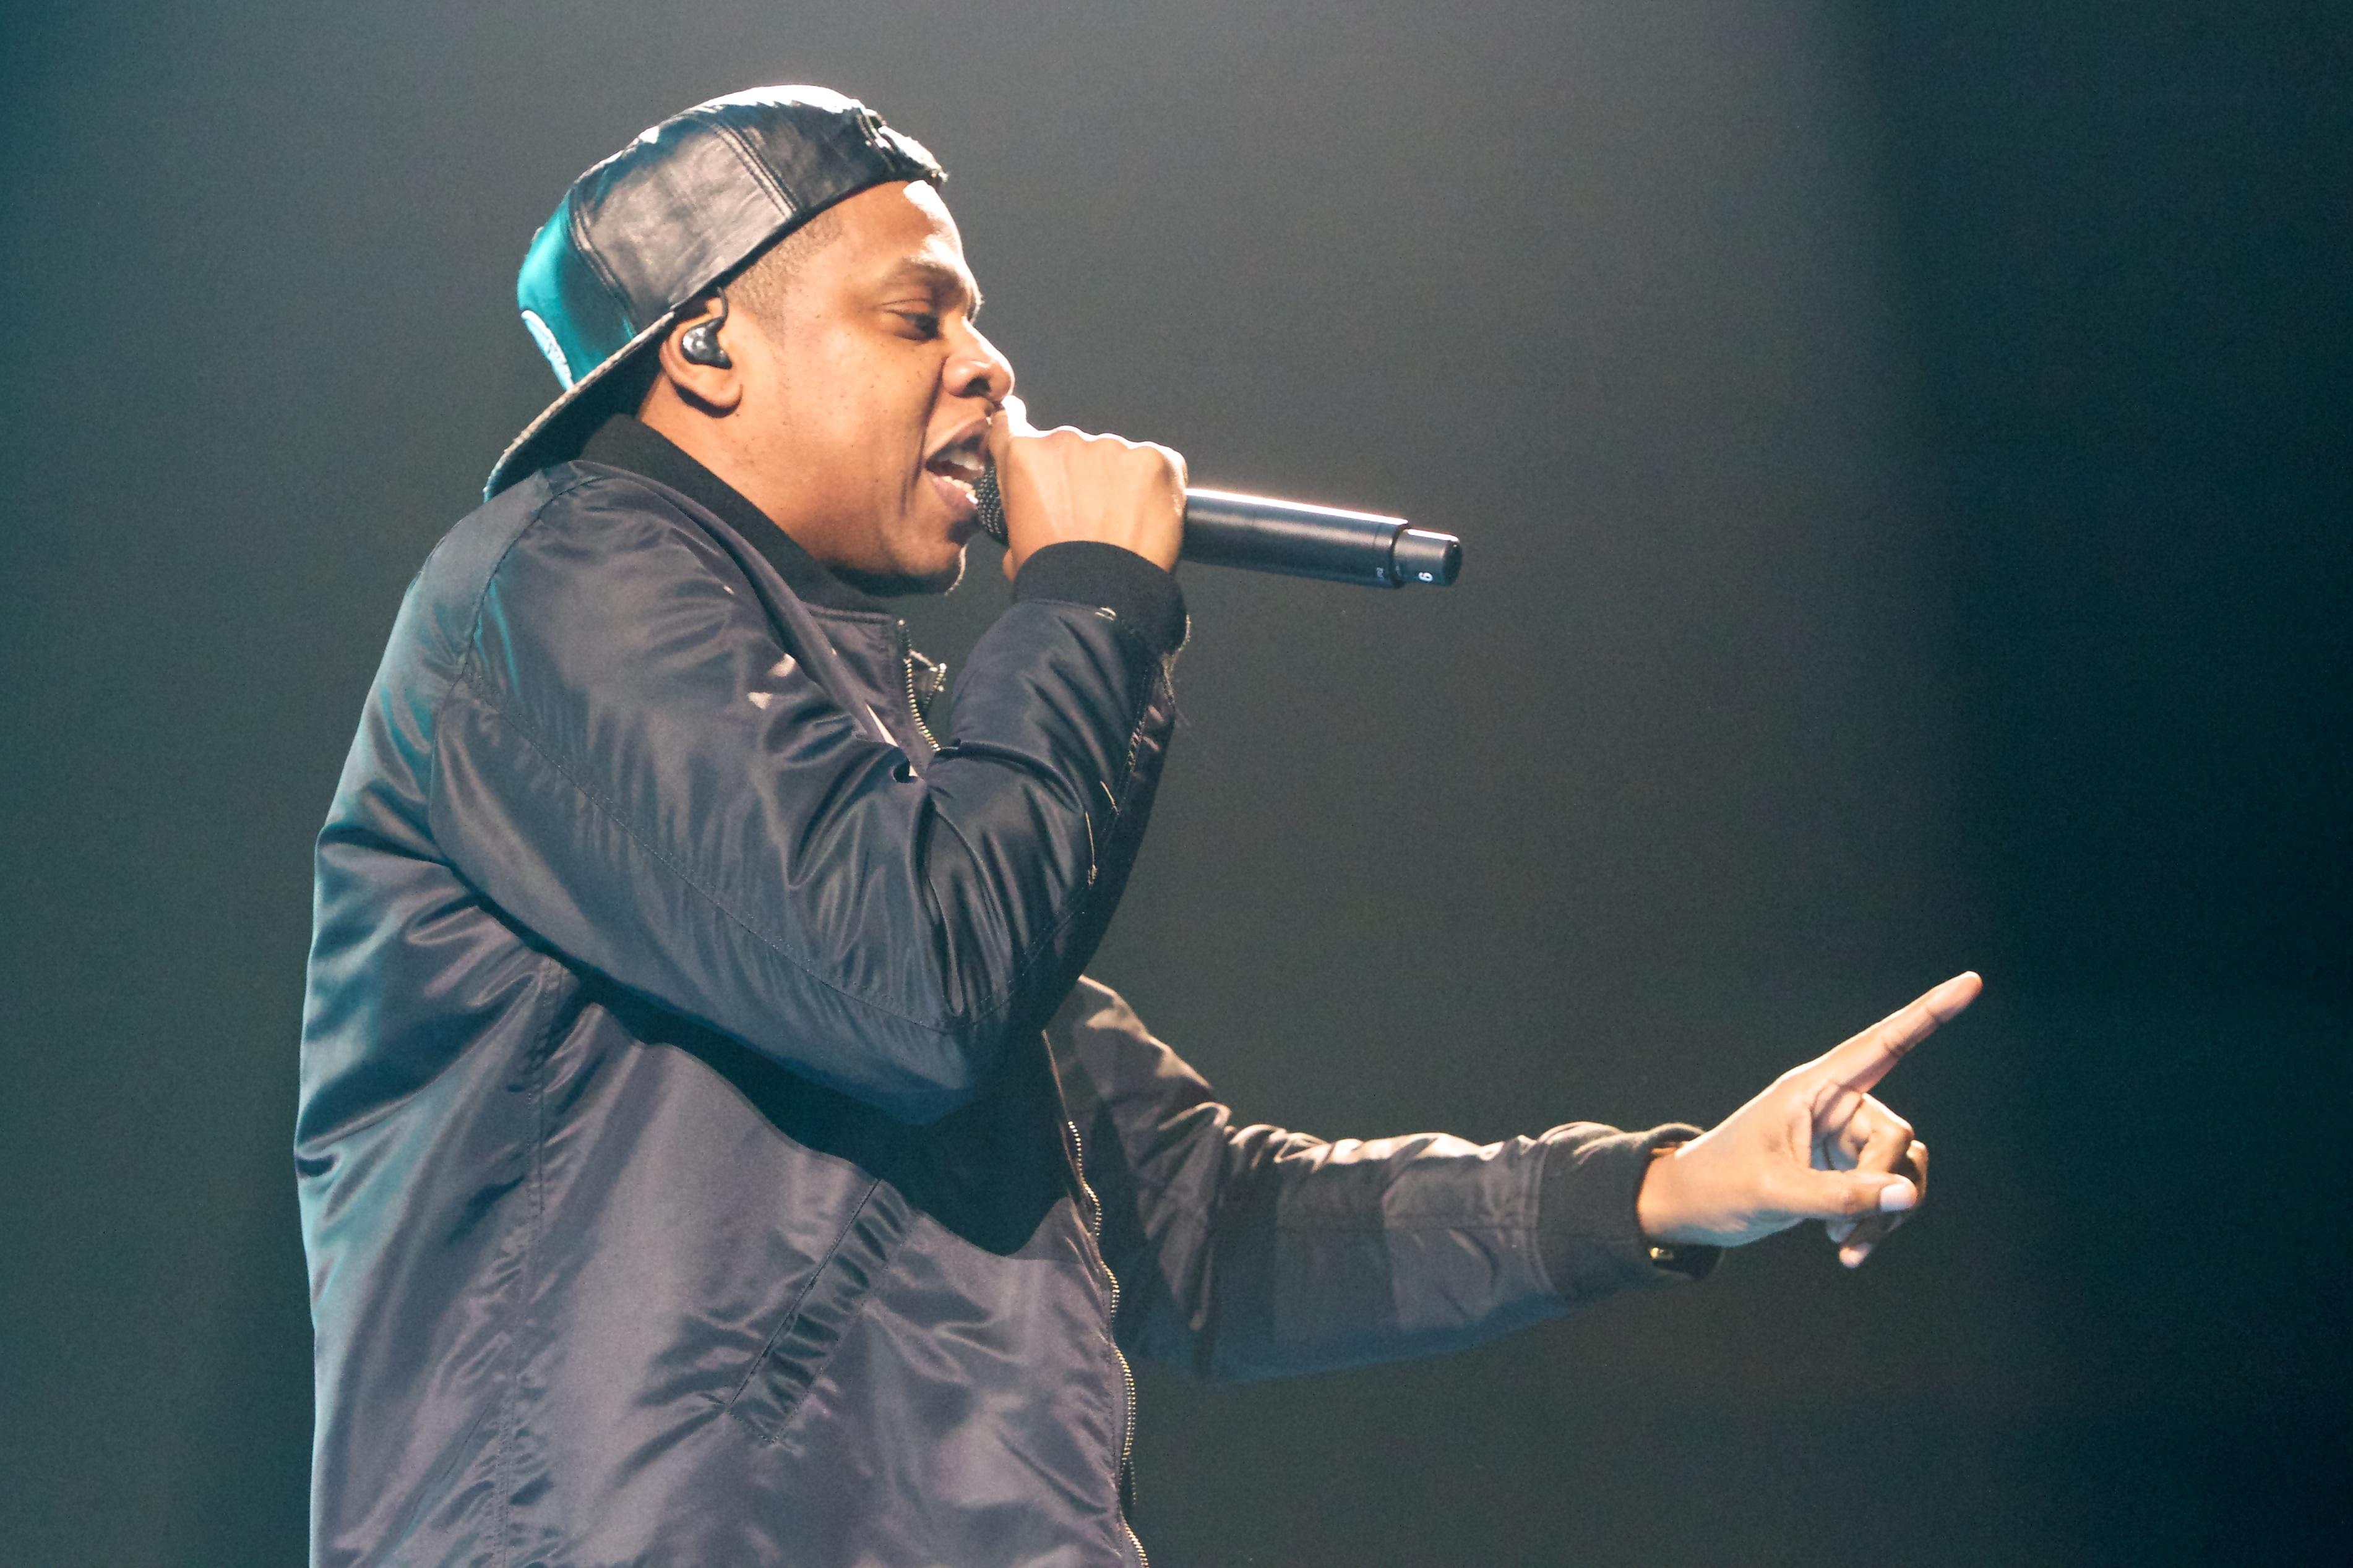 Majandus.ee Jay Z Foto: PantherMedia Falk Simon